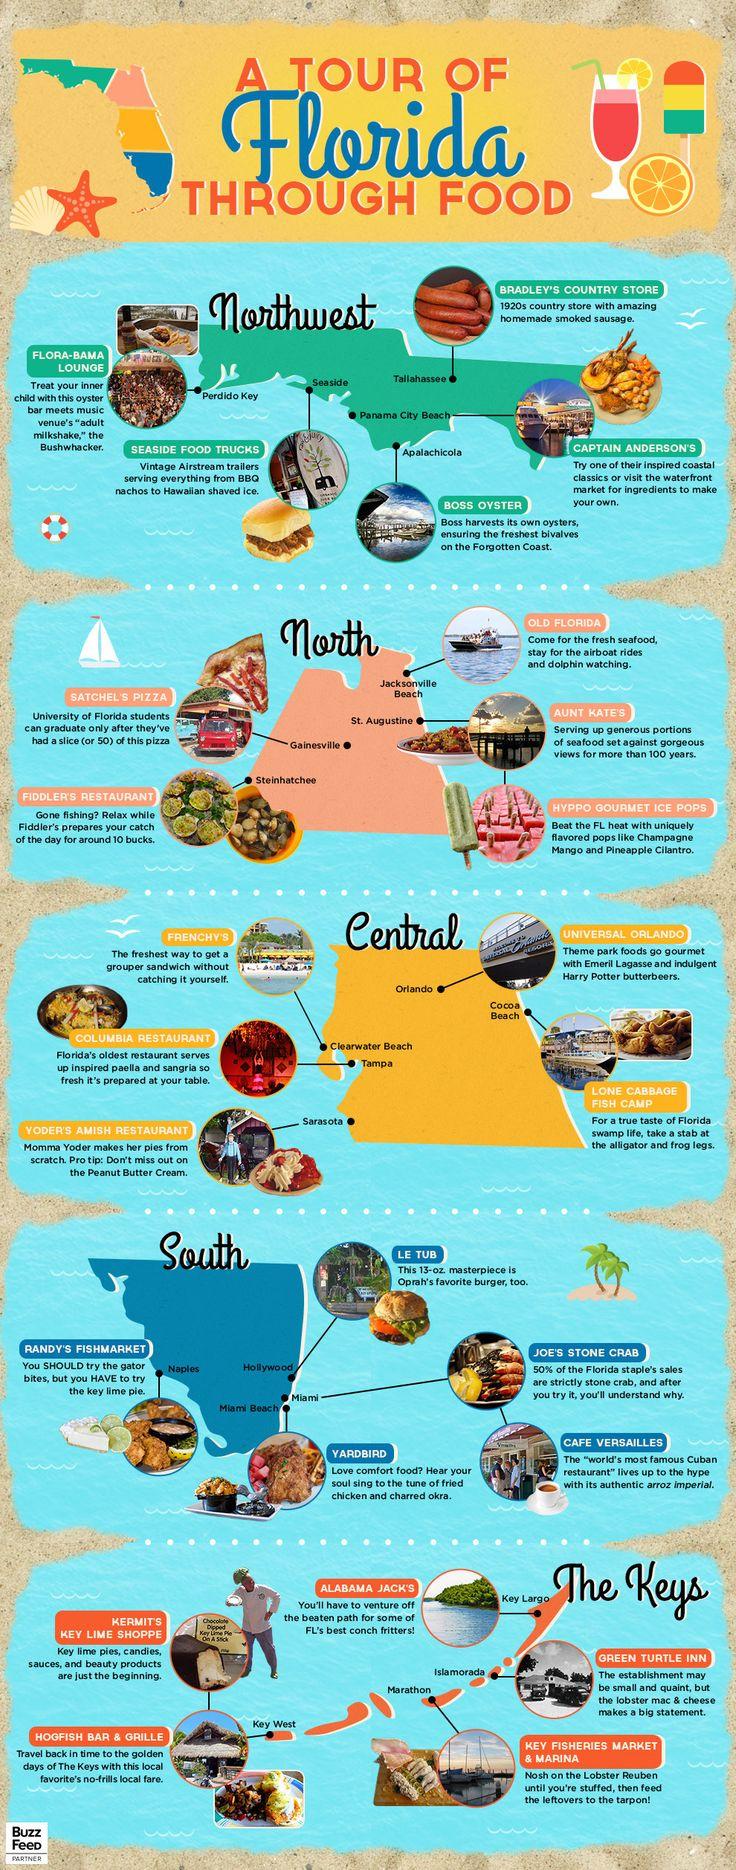 A Tour Of Florida Through Food. Don't miss Oprah's favorite burger in Miami!